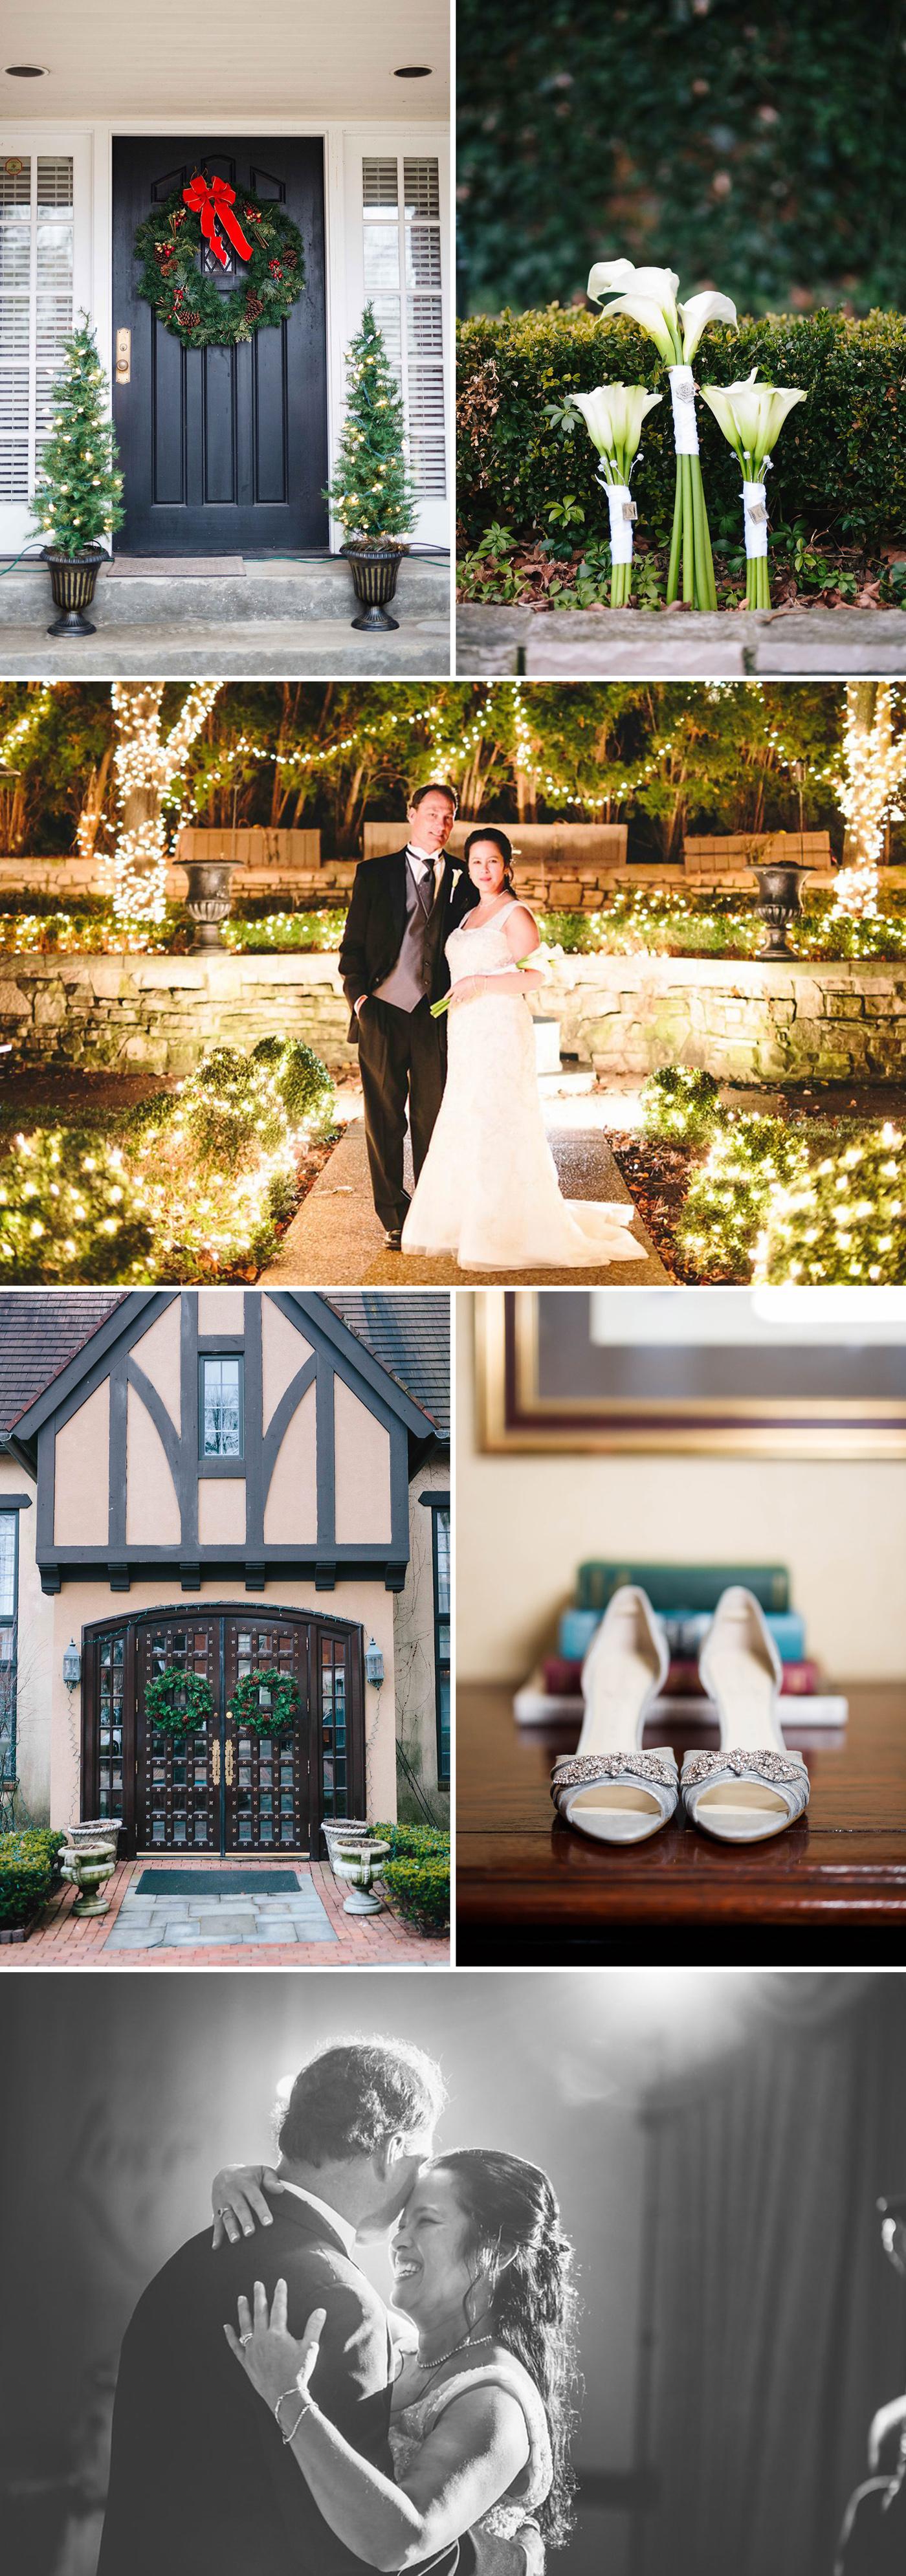 chicago-fine-art-wedding-photography-nenn-married